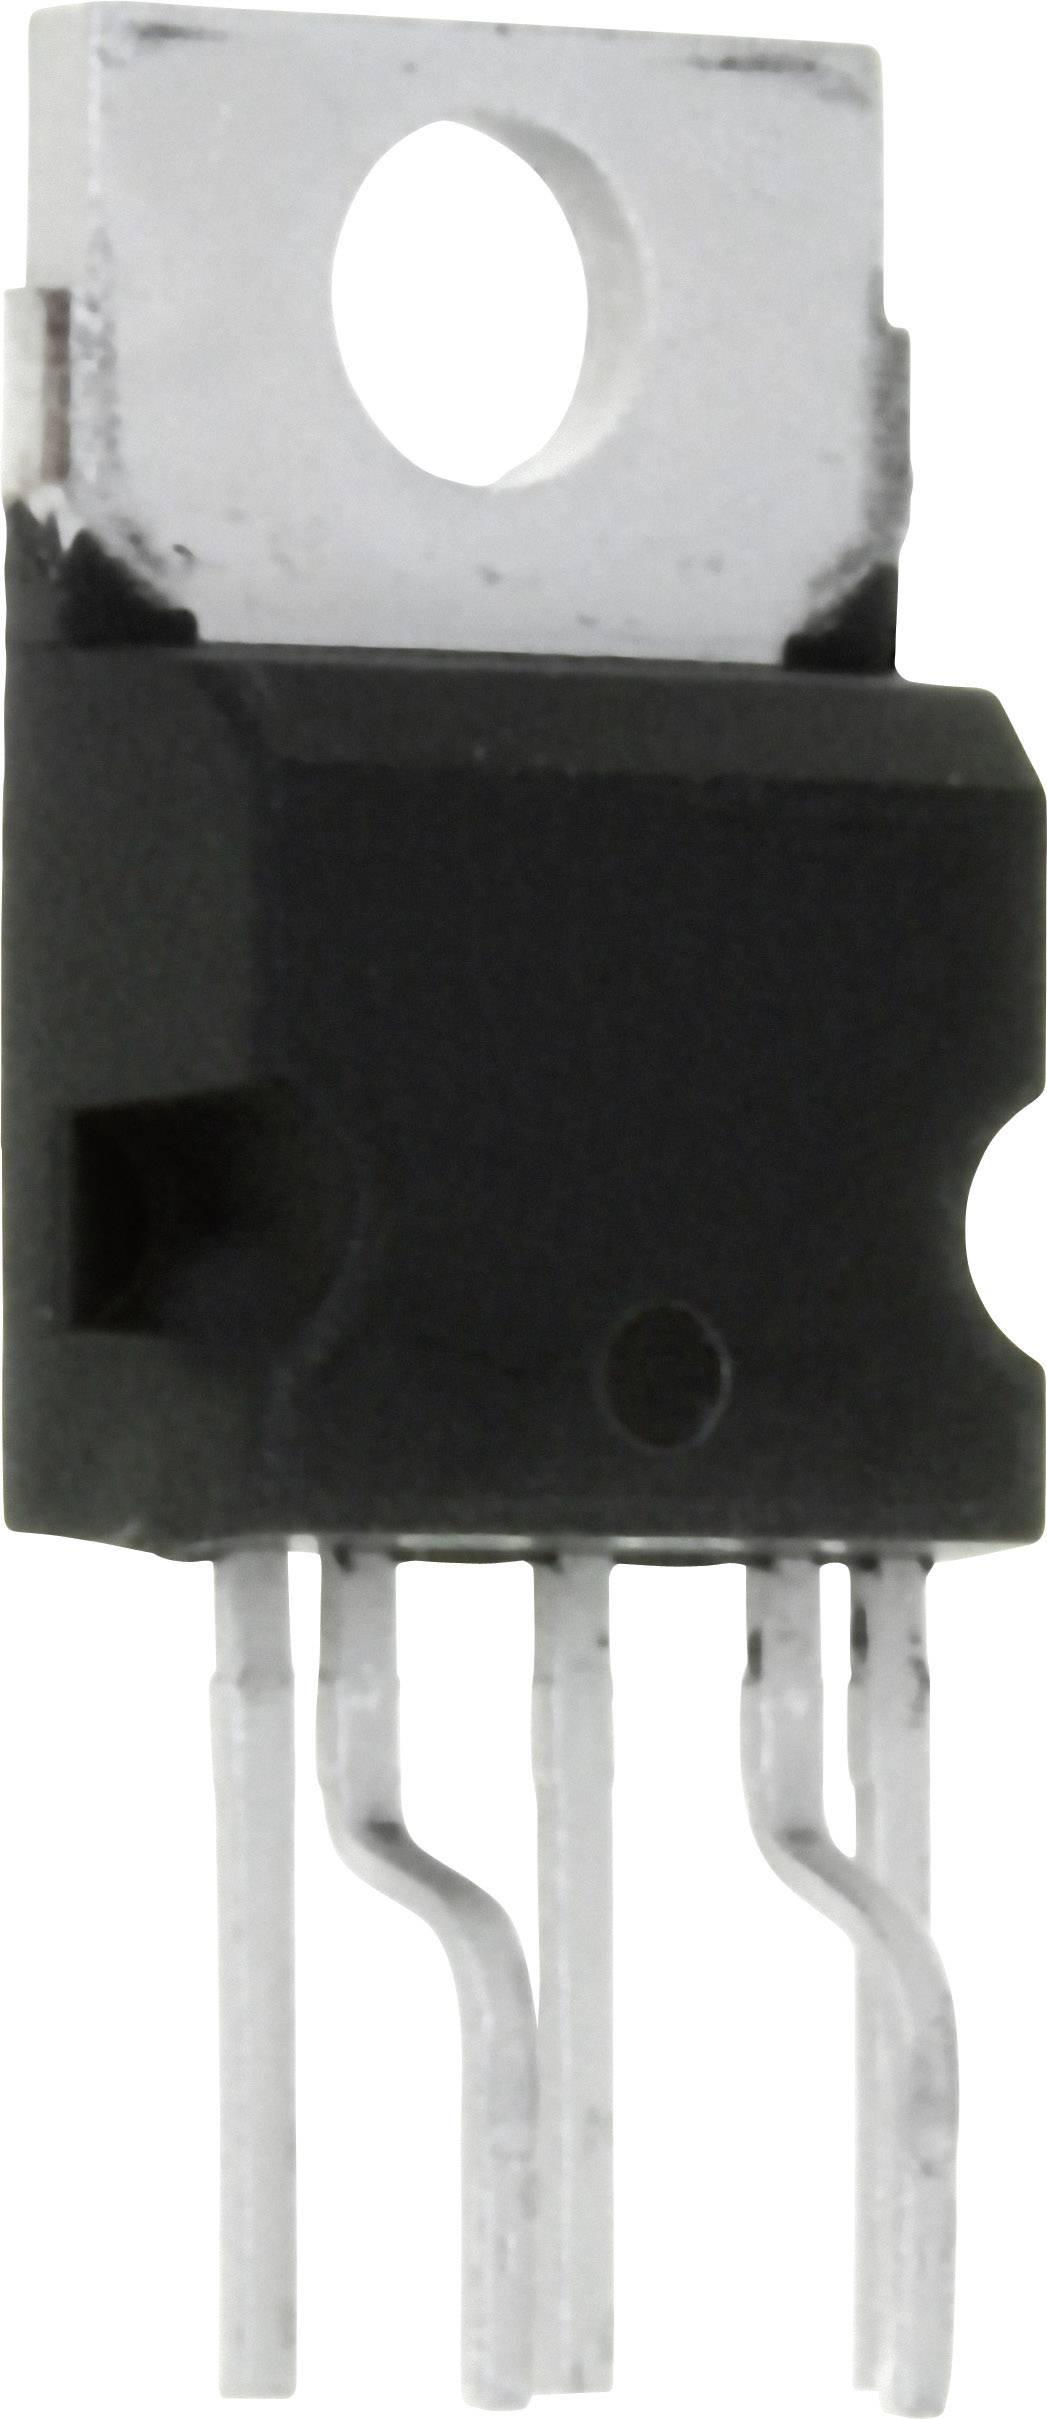 PMICAC/DCmenič,offlineprepínač STMicroelectronics VIPER100A-E, PENTAWATT-5